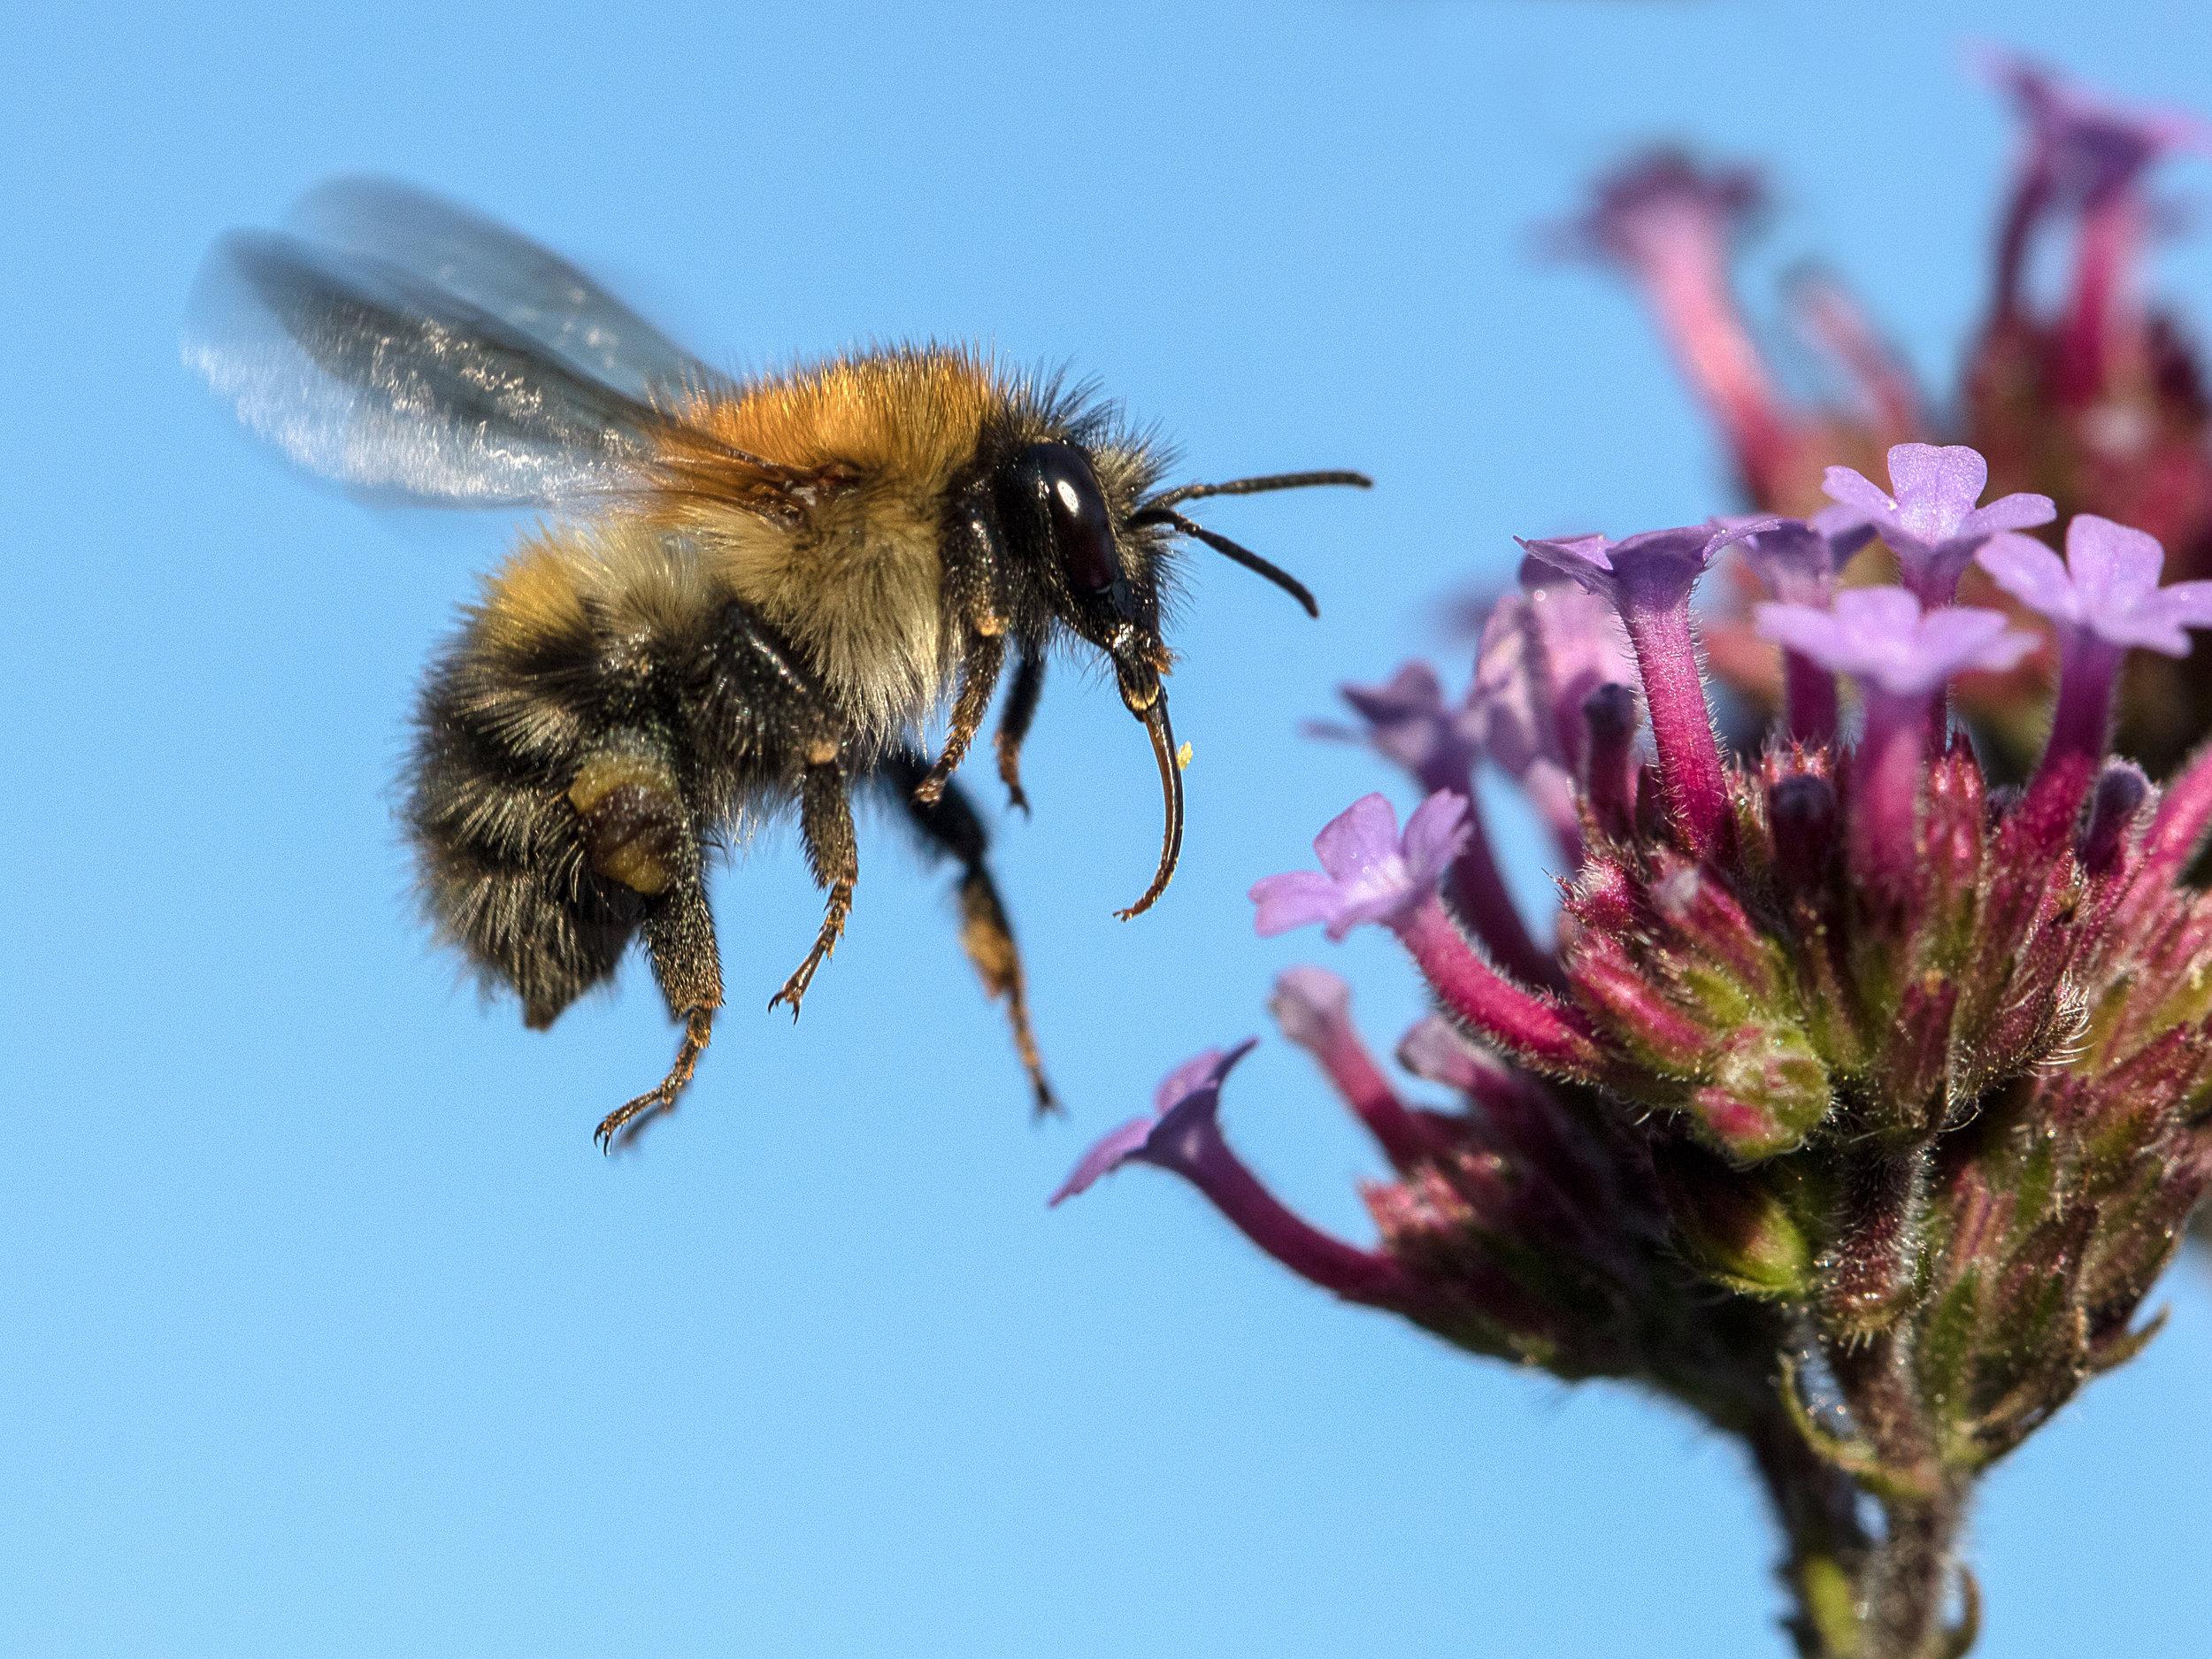 2. Dave Taylor - Bumblebee